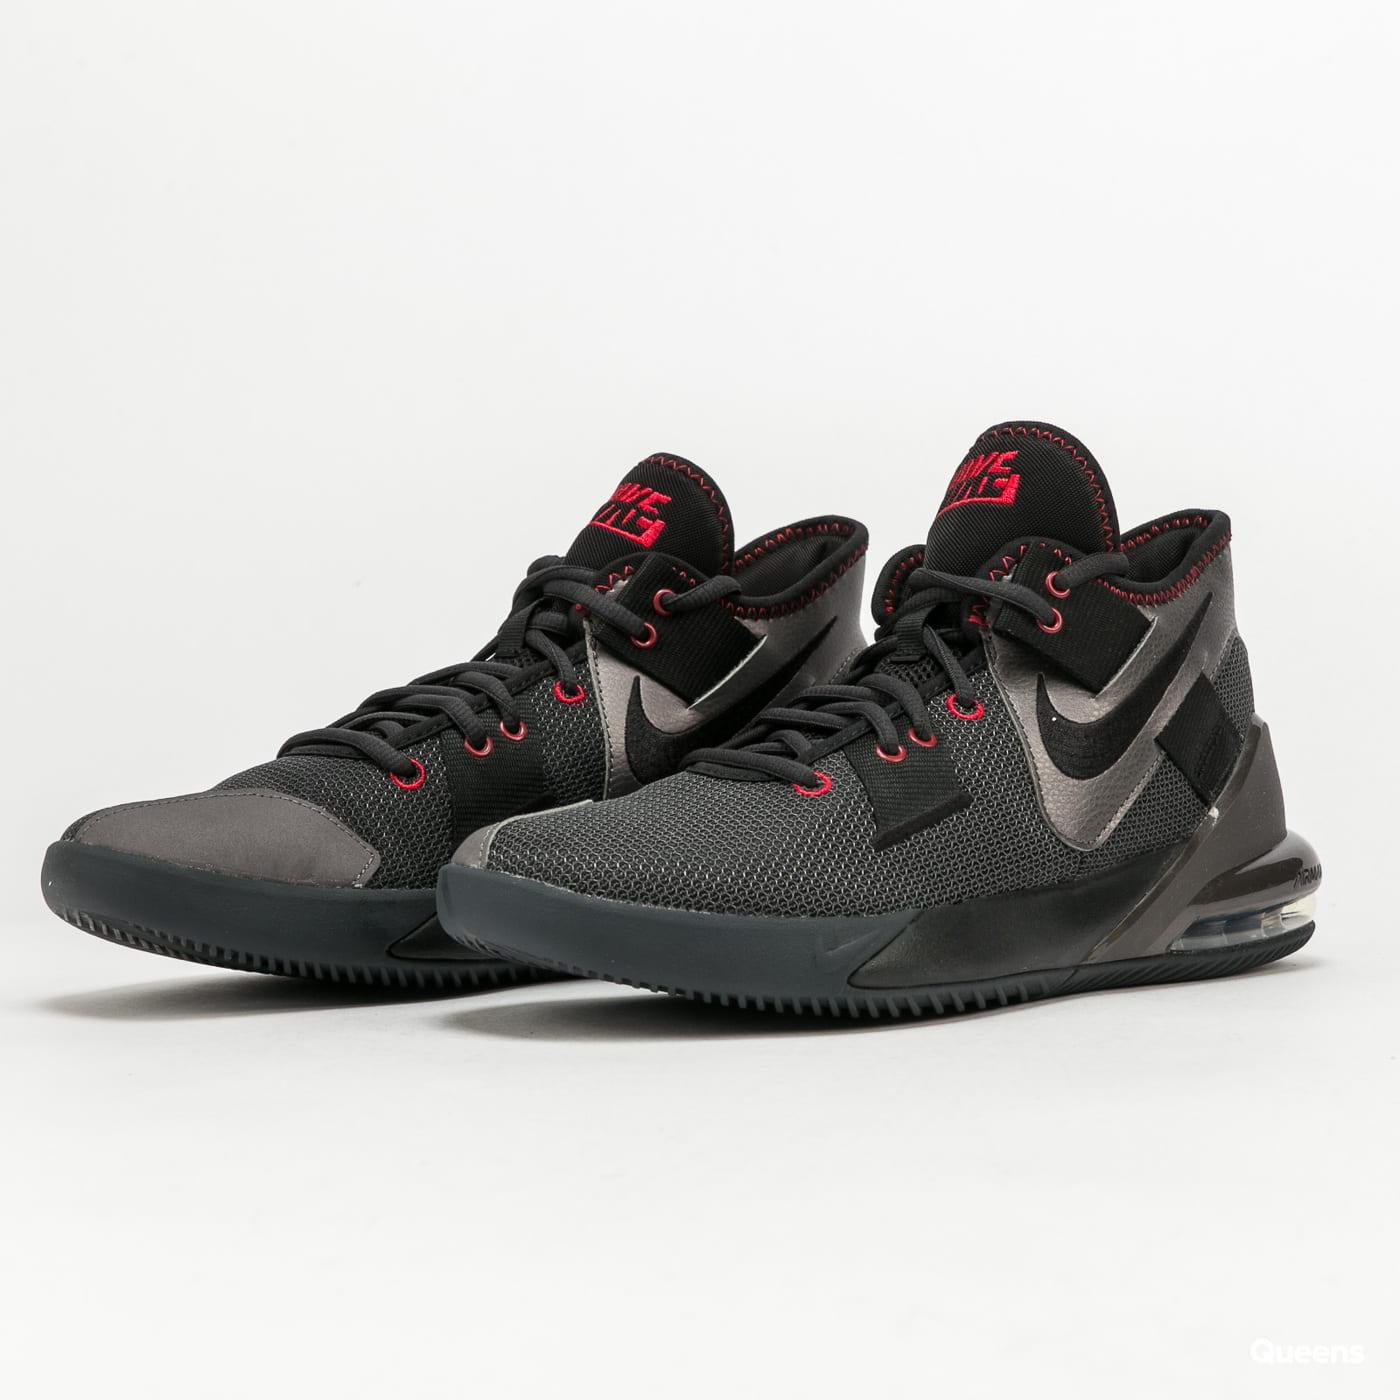 Nike Air Max Impact 2 anthracite / black